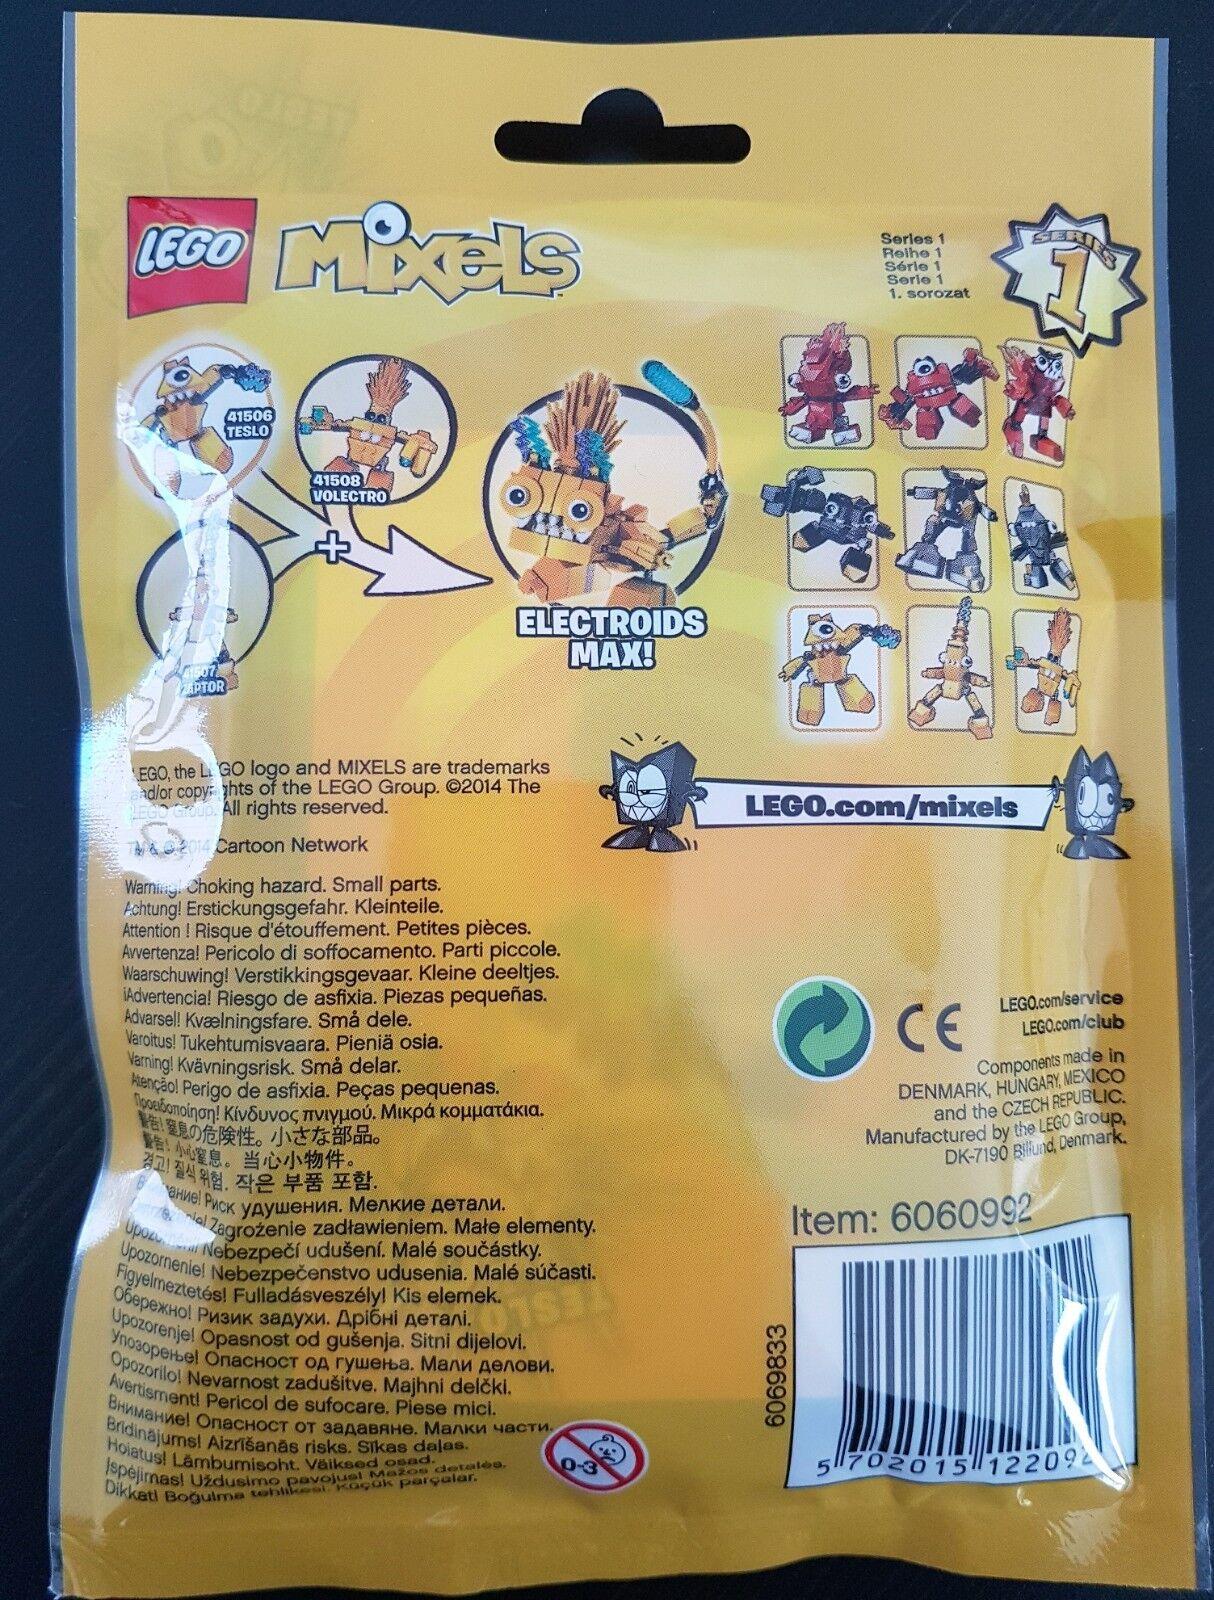 LEGO LEGO LEGO Mixels Teslo   Serie 1 Electroids   41506   gelb   NEU 5d88ee